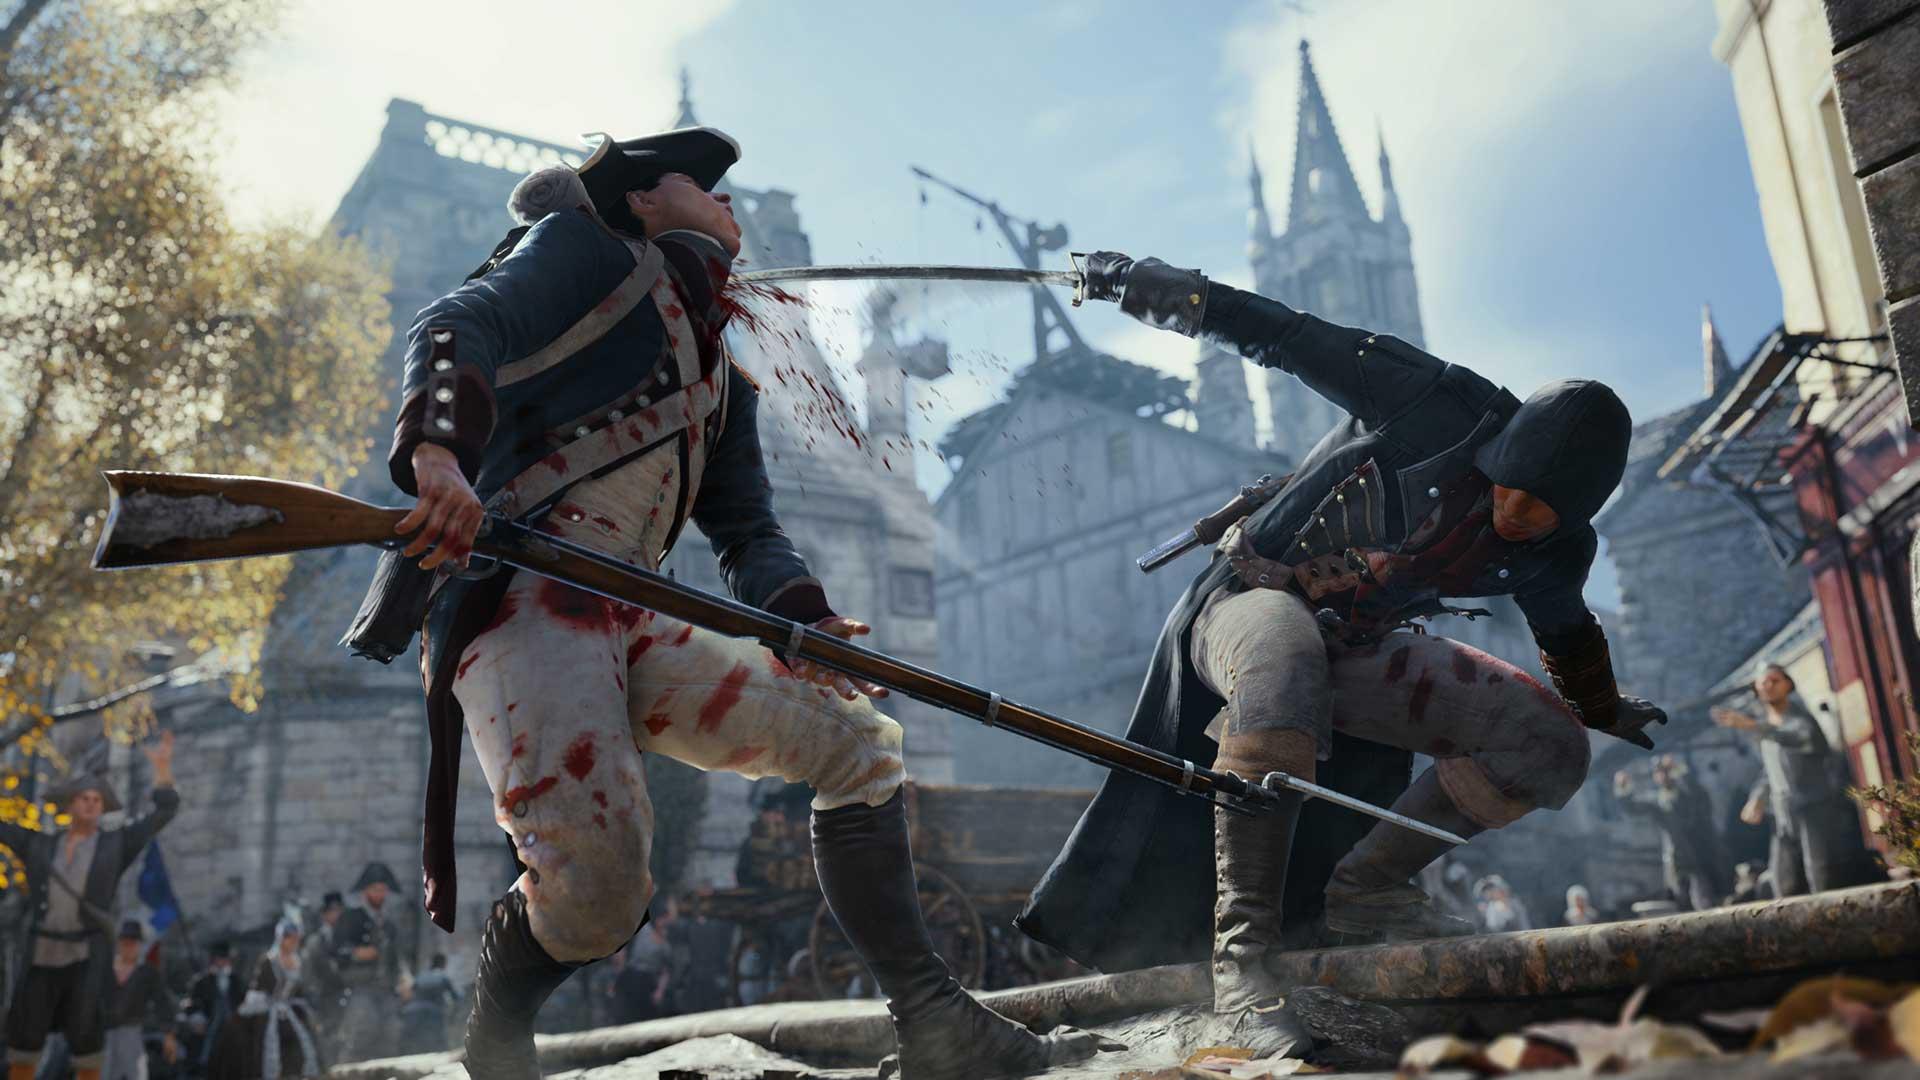 [FIXO] Assassin's Creed Unity ACU-media-SS-6-big_147455